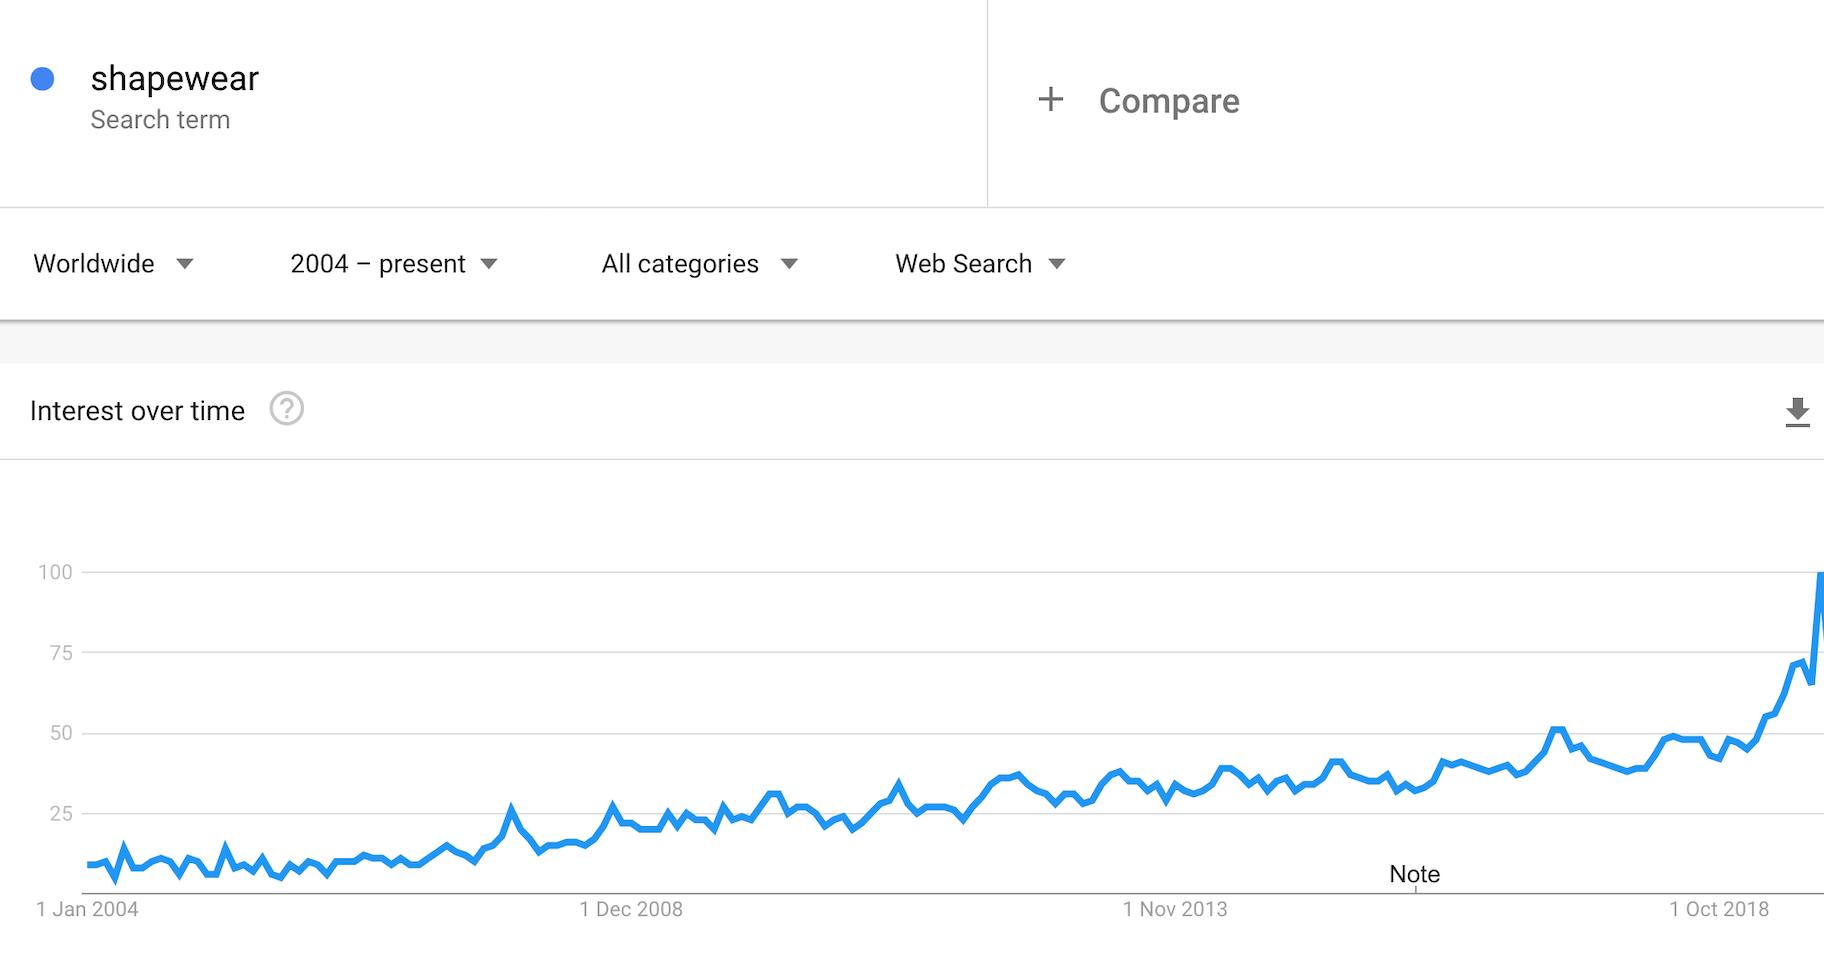 shapeware demand on the rise